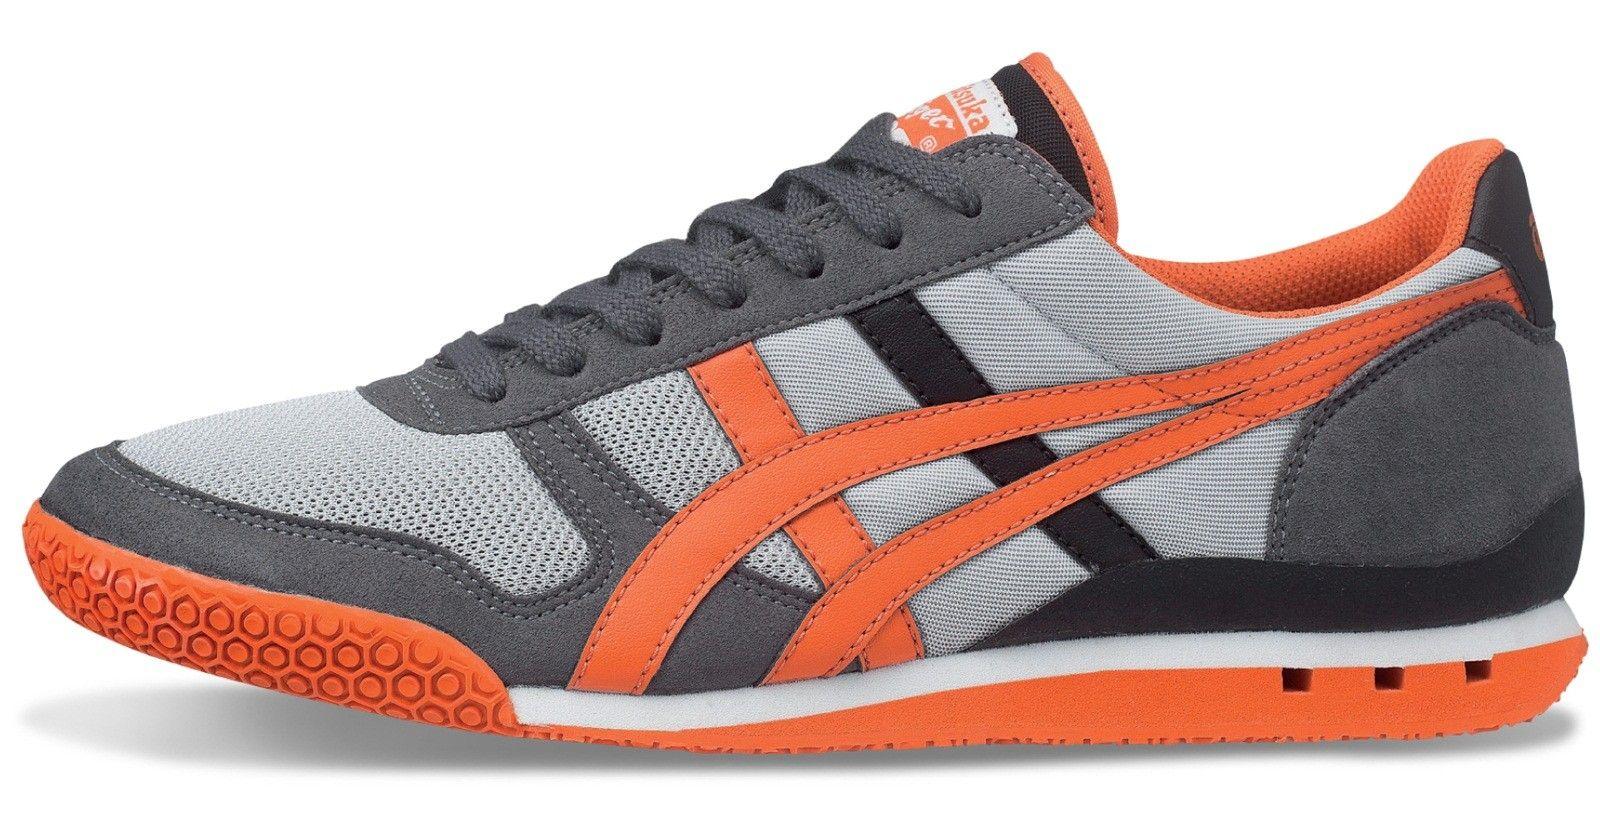 best sneakers f0035 1f47a Onitsuka Tiger Ultimate 81 Light Grey/Orange (HN201-1309 ...